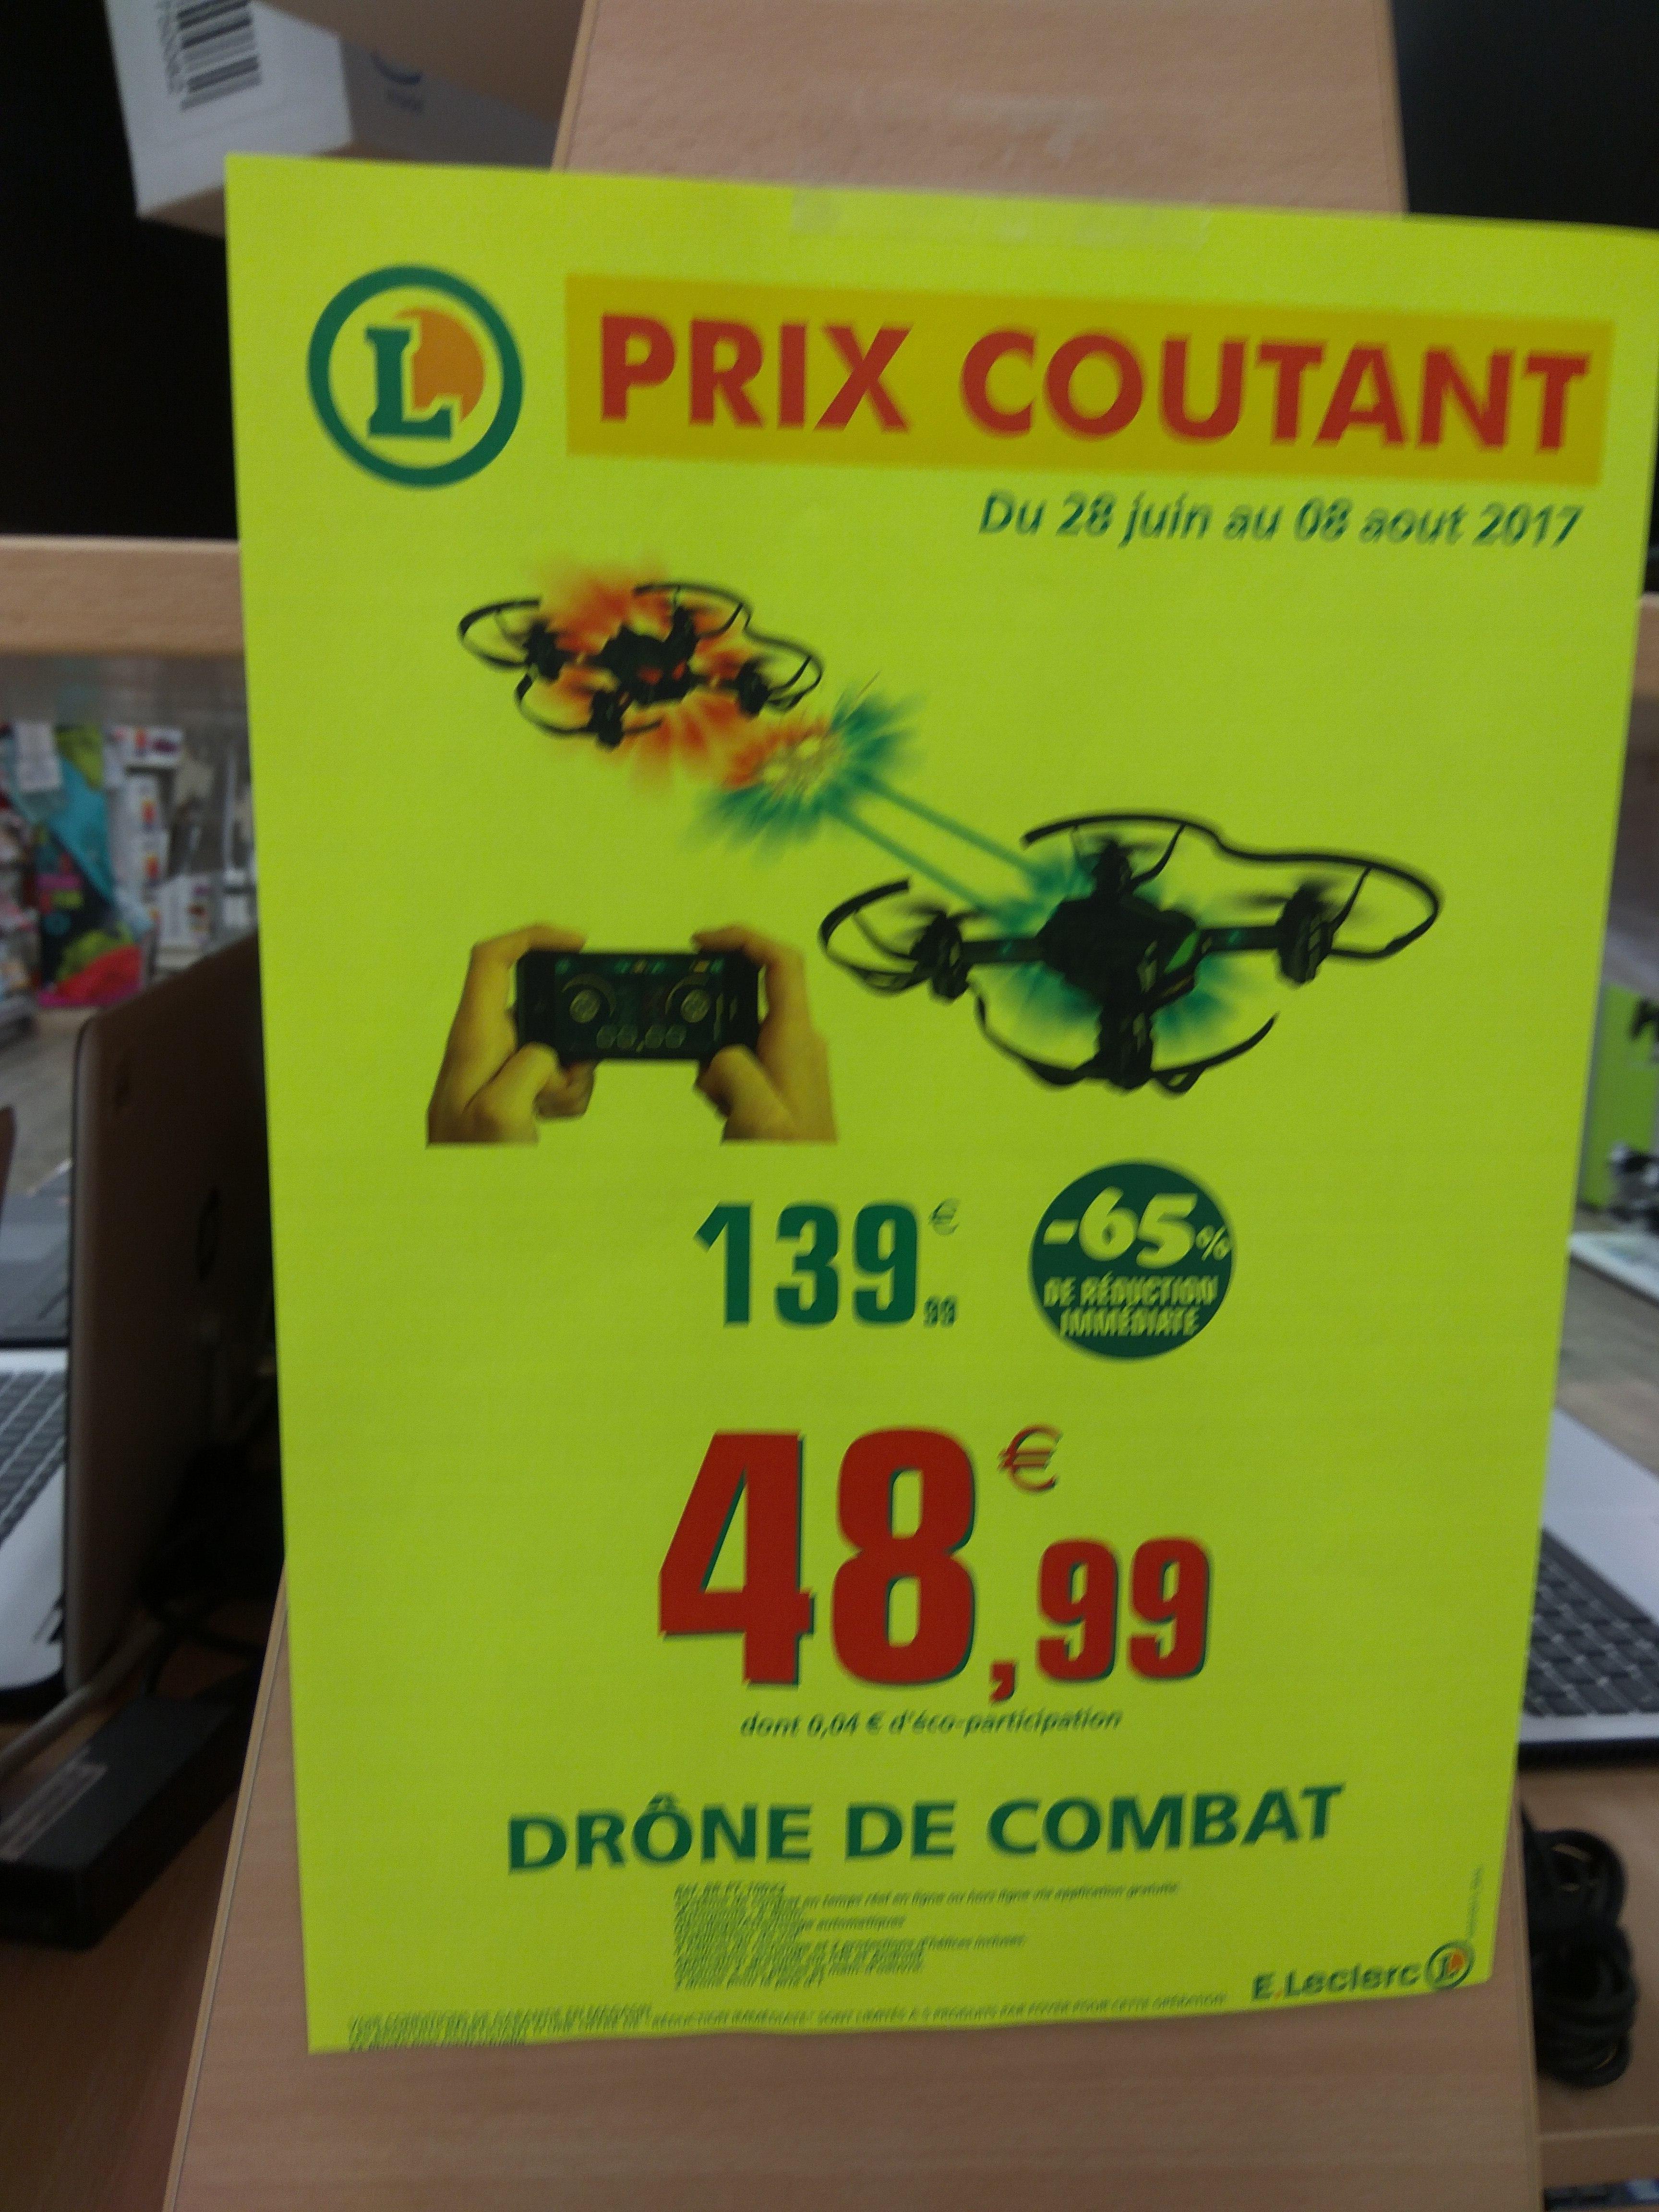 Drône de combat Petrone Drone Fighter + KIt FPV